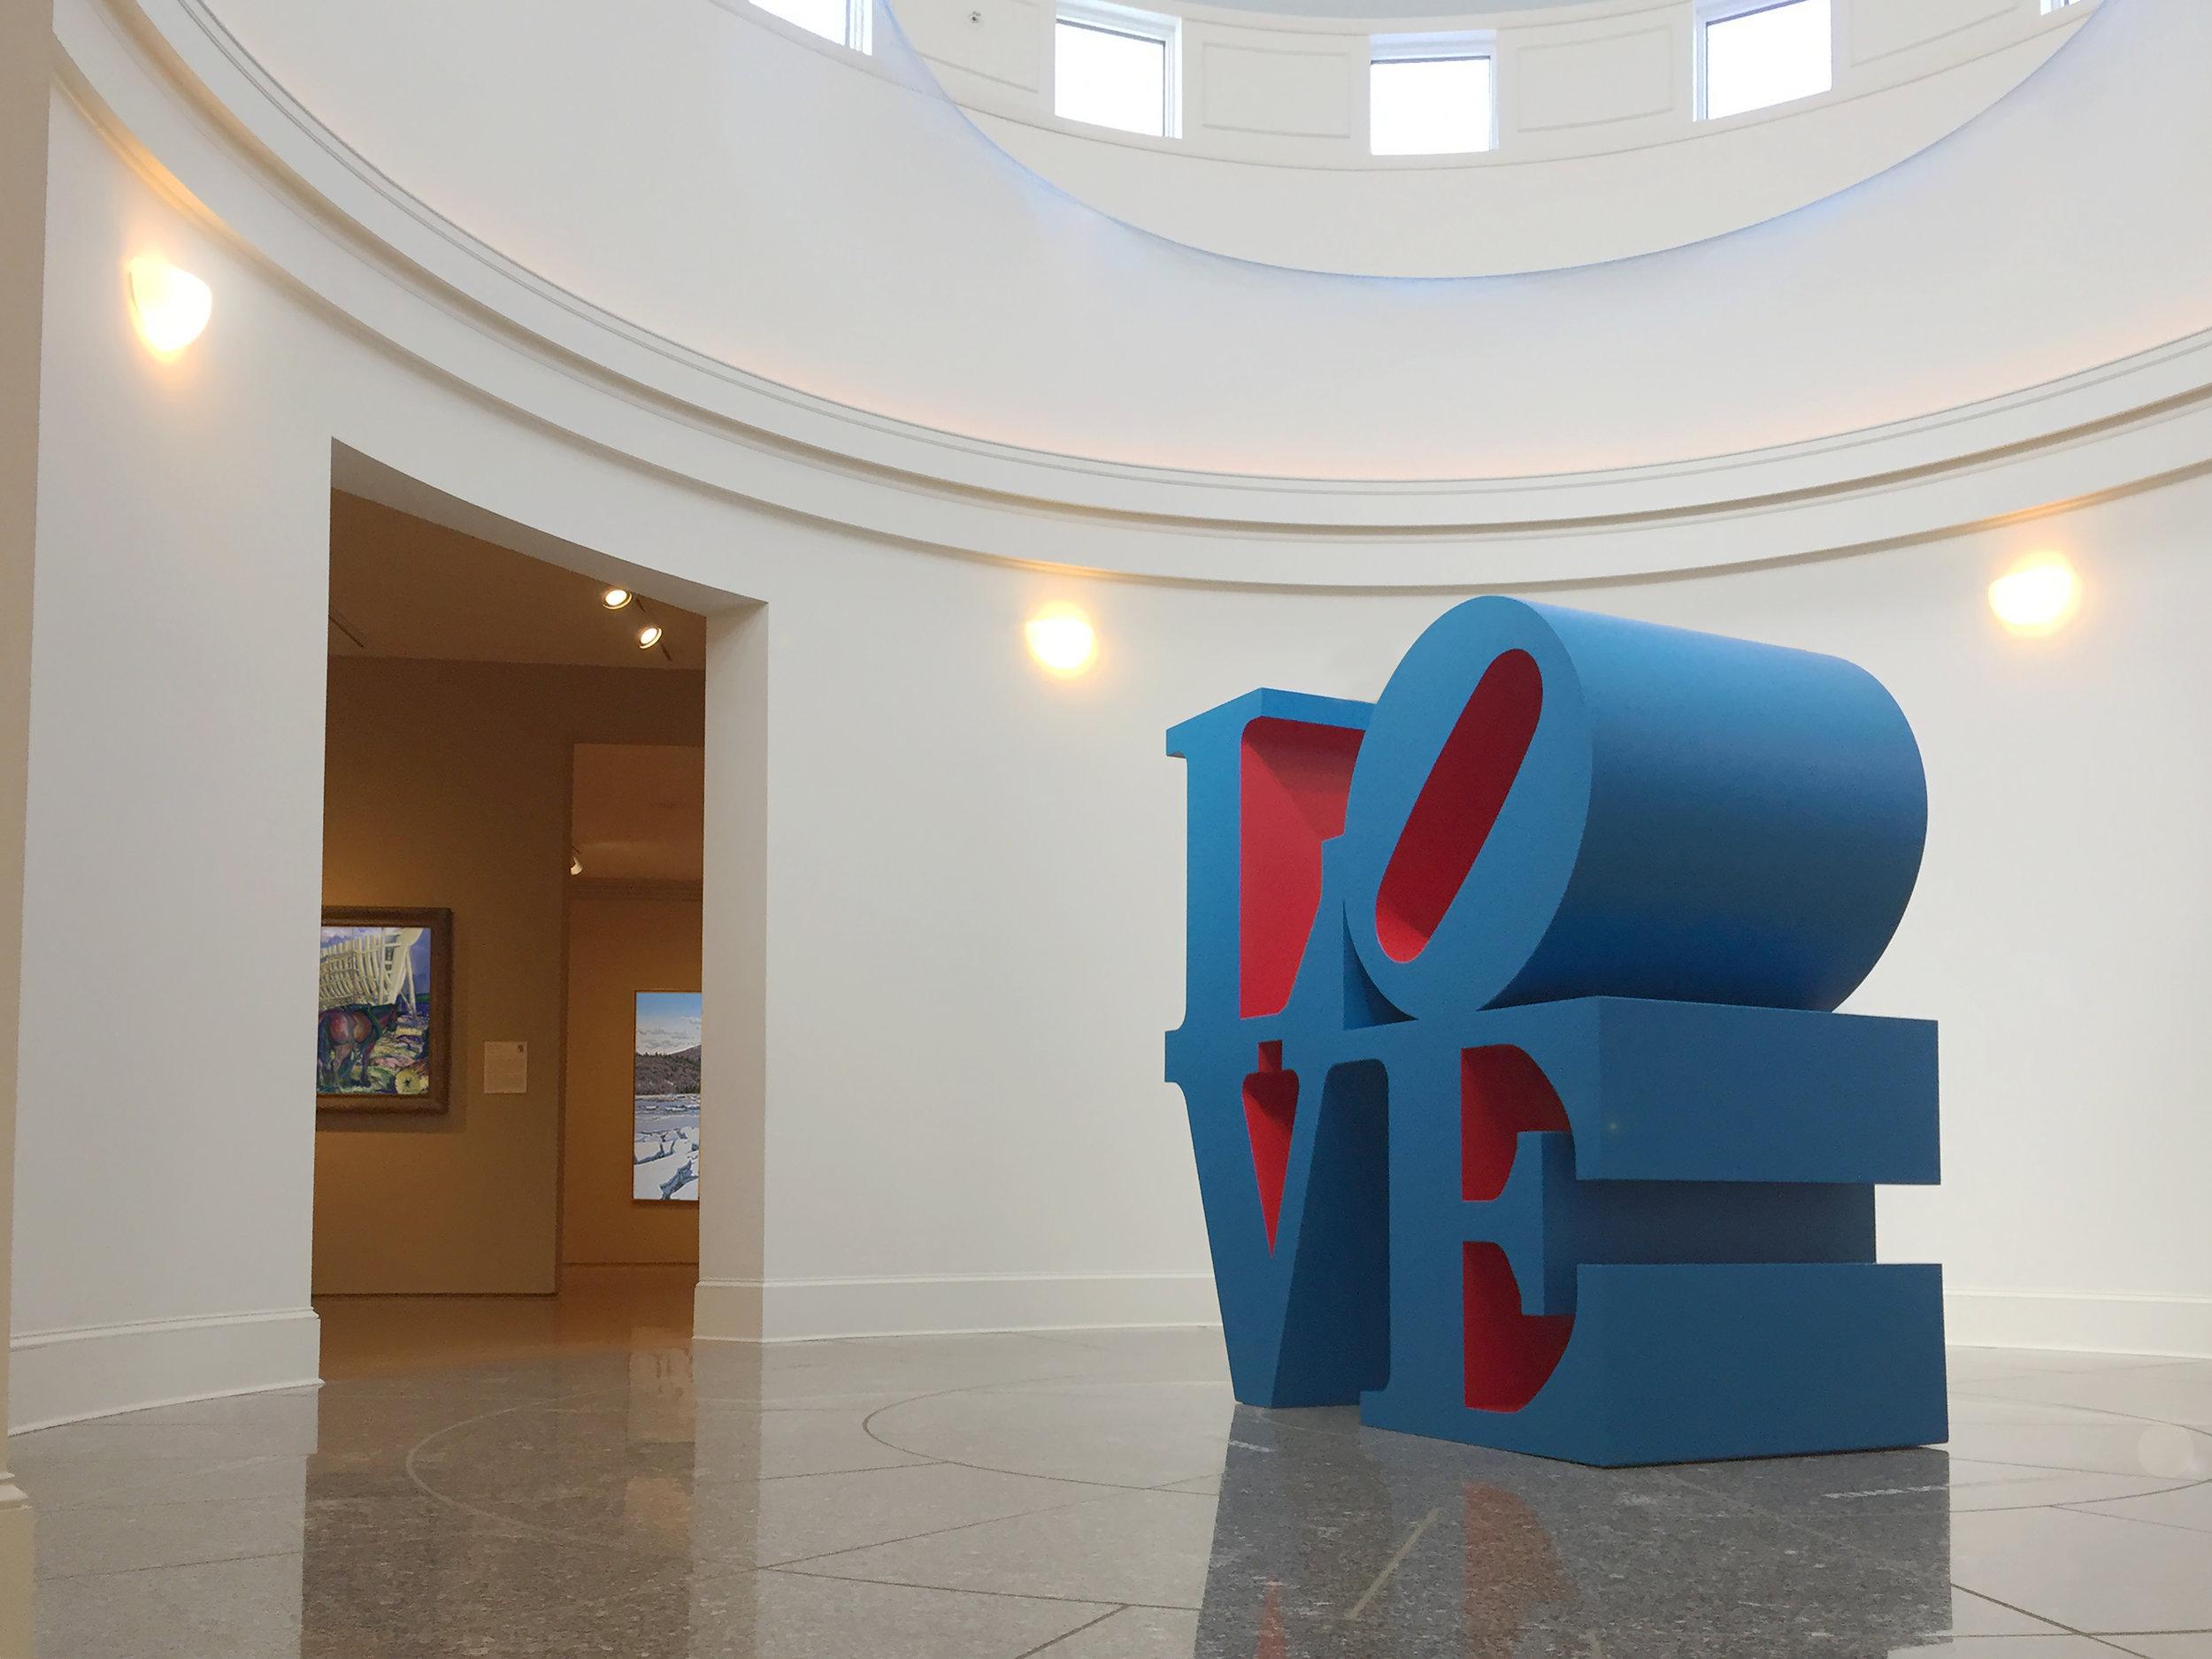 Image courtesy: Farnsworth Museum of Art